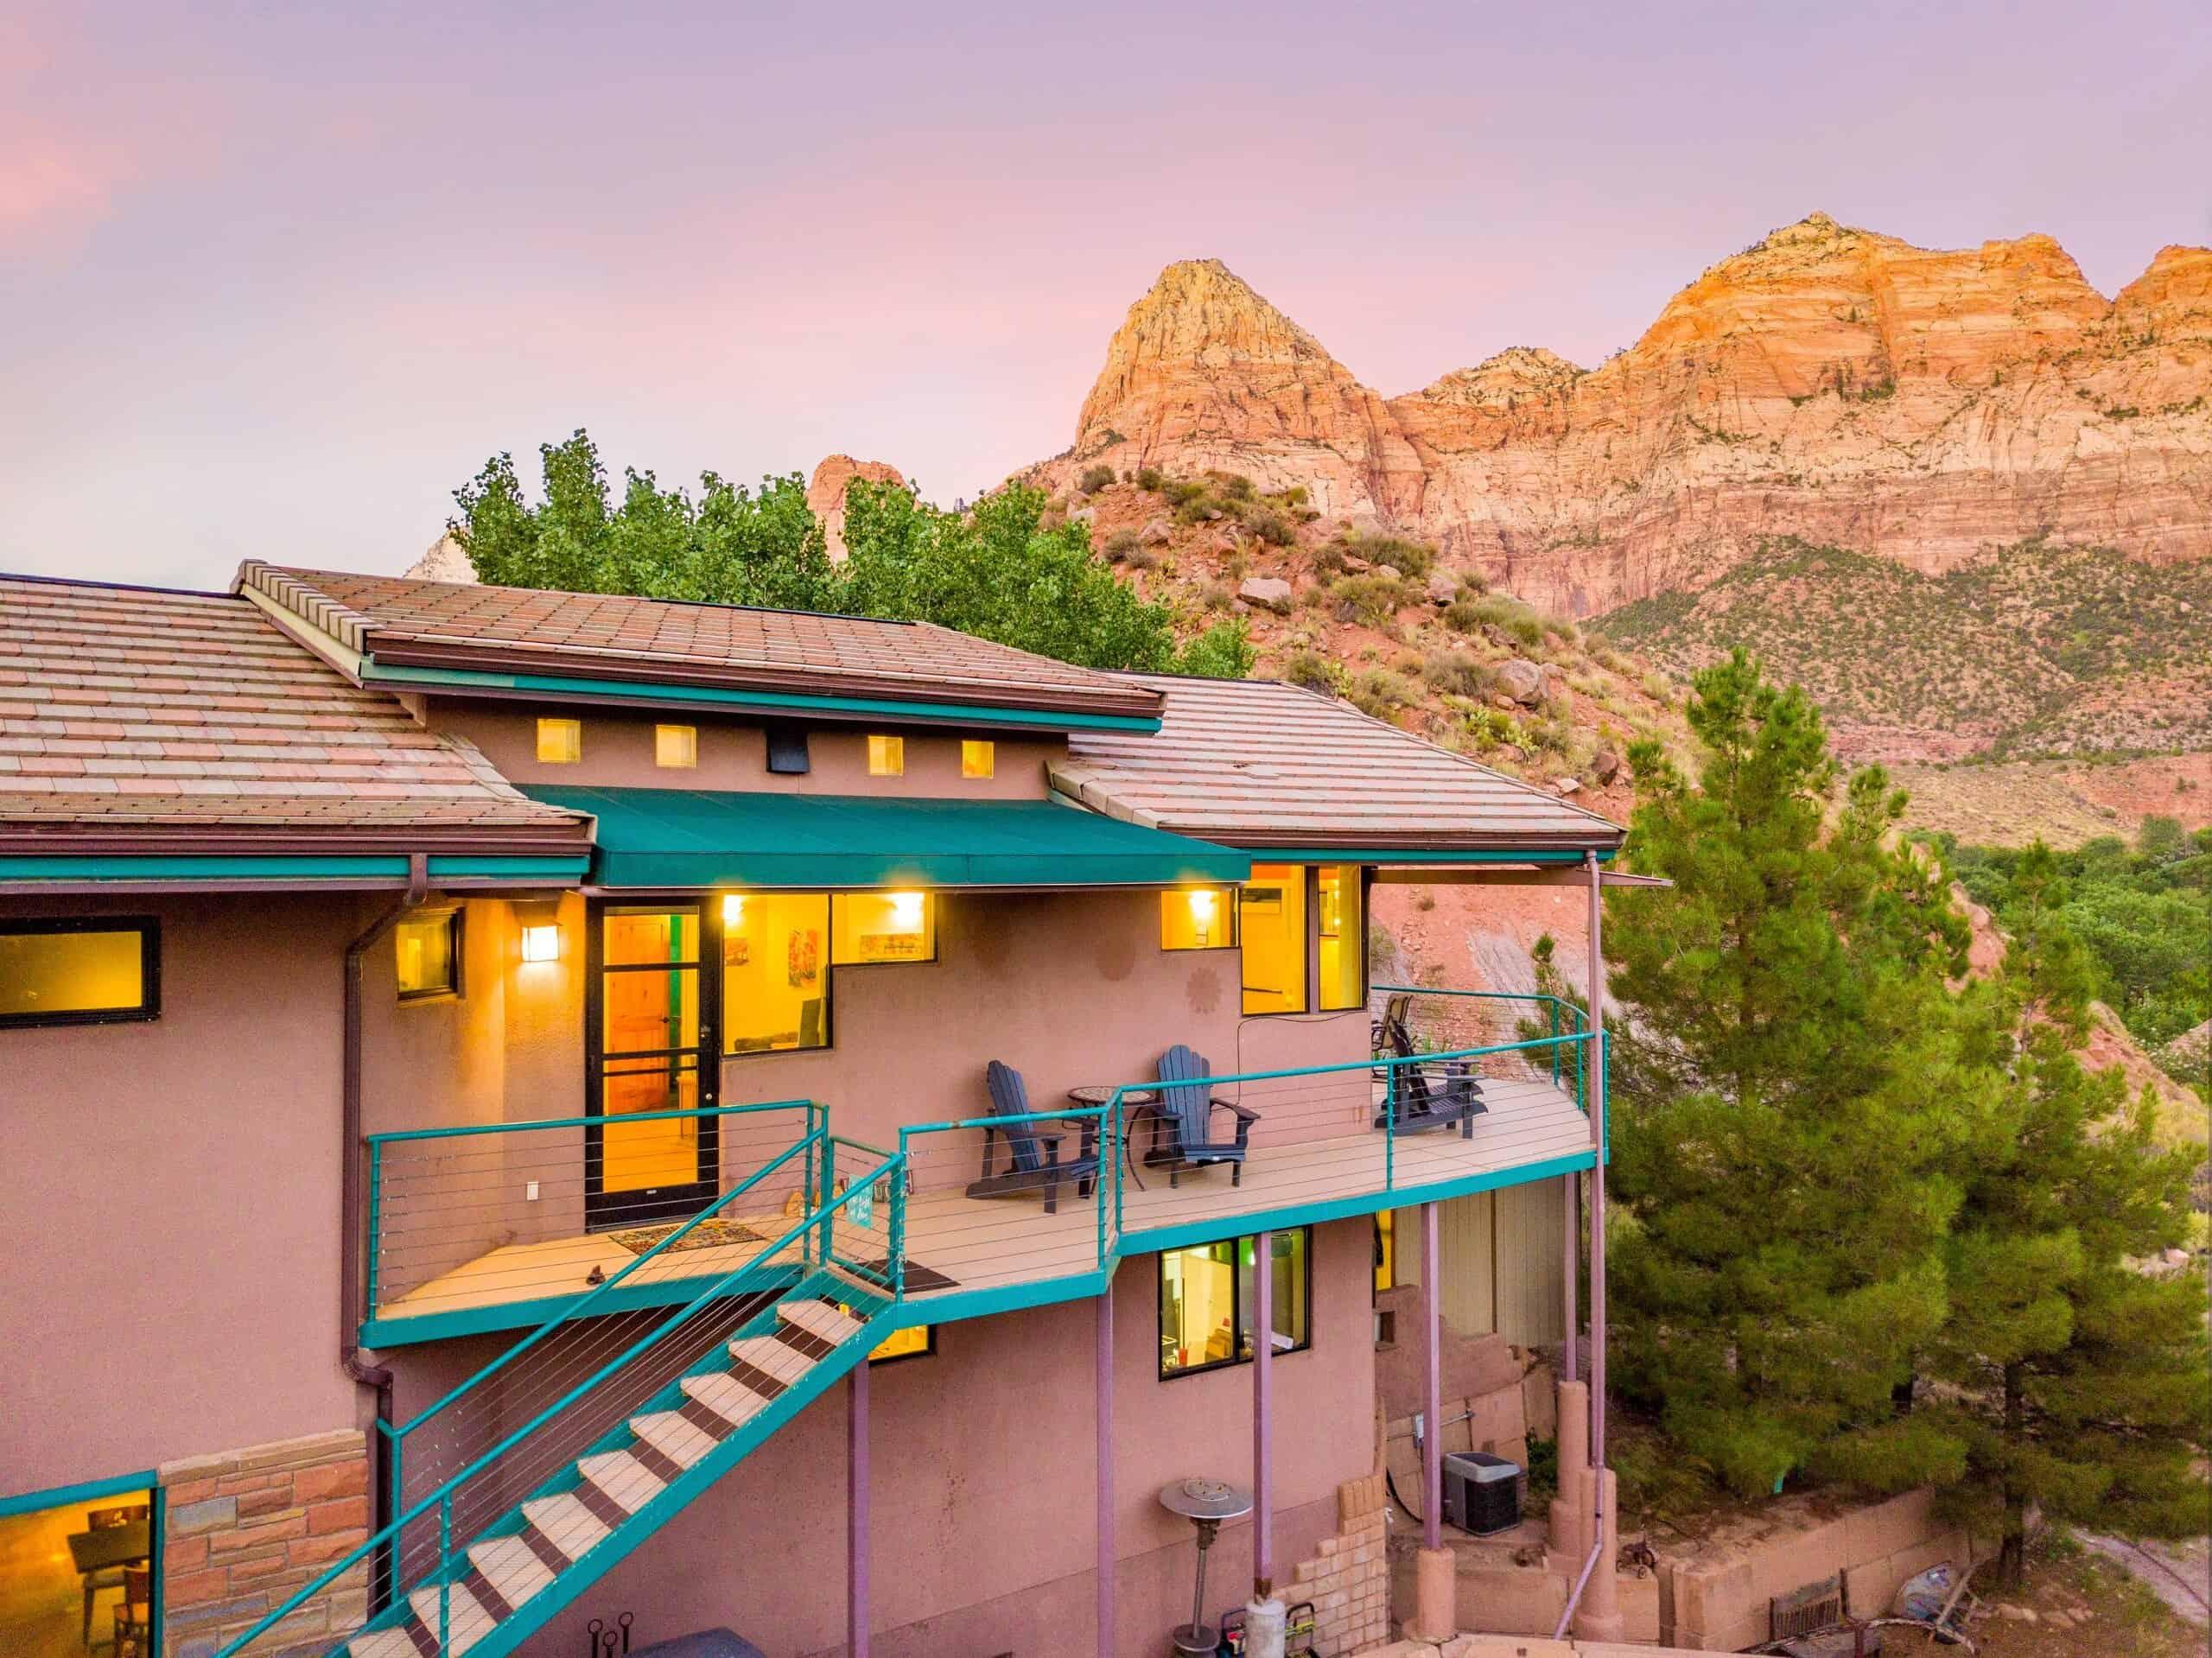 zion NP loft airbnb